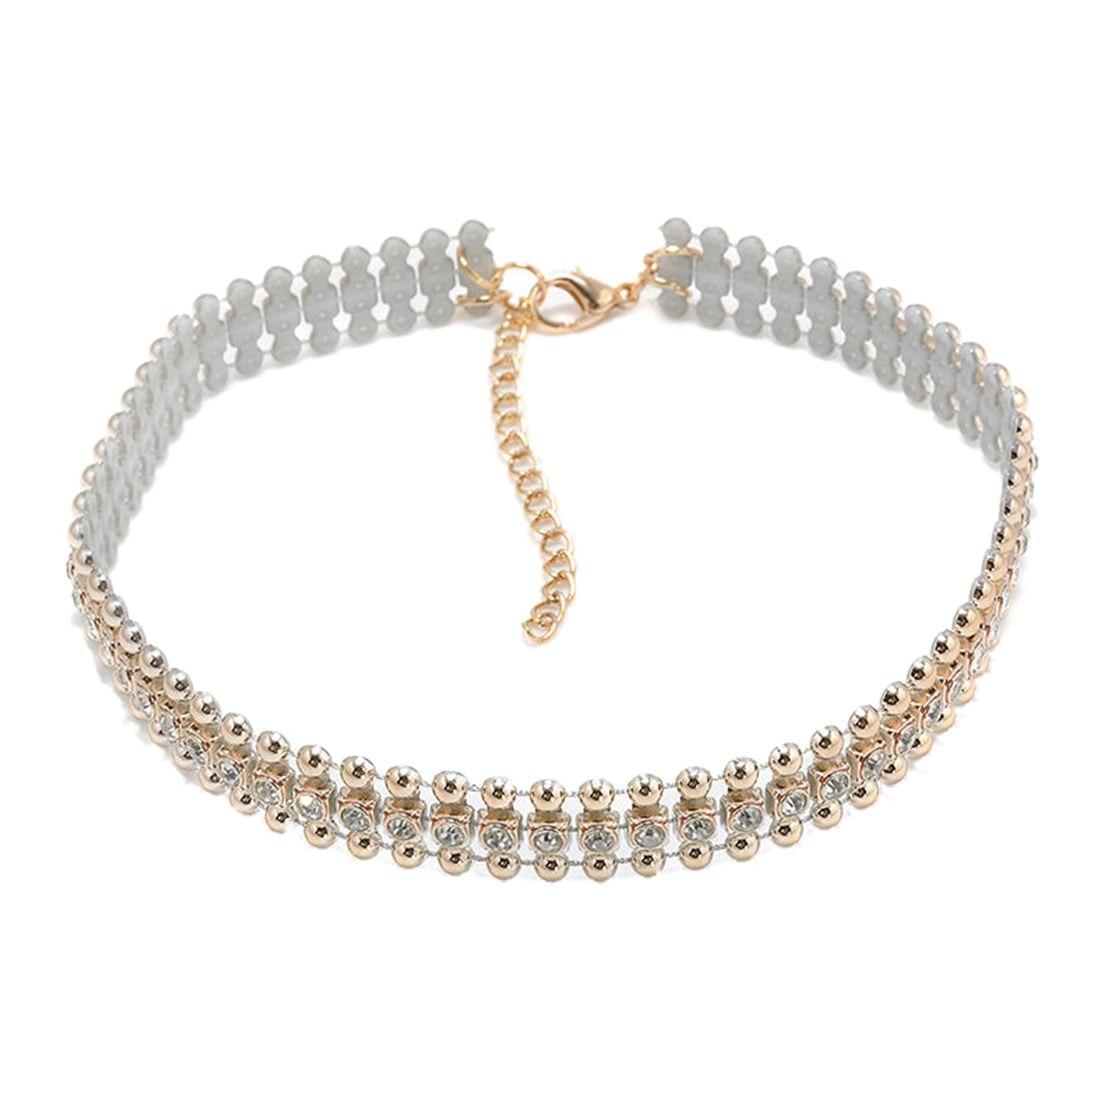 Women Choker Collar Gold Necklace Rhinestone Crystal Beads Pendant Chain font b Jewelry b font